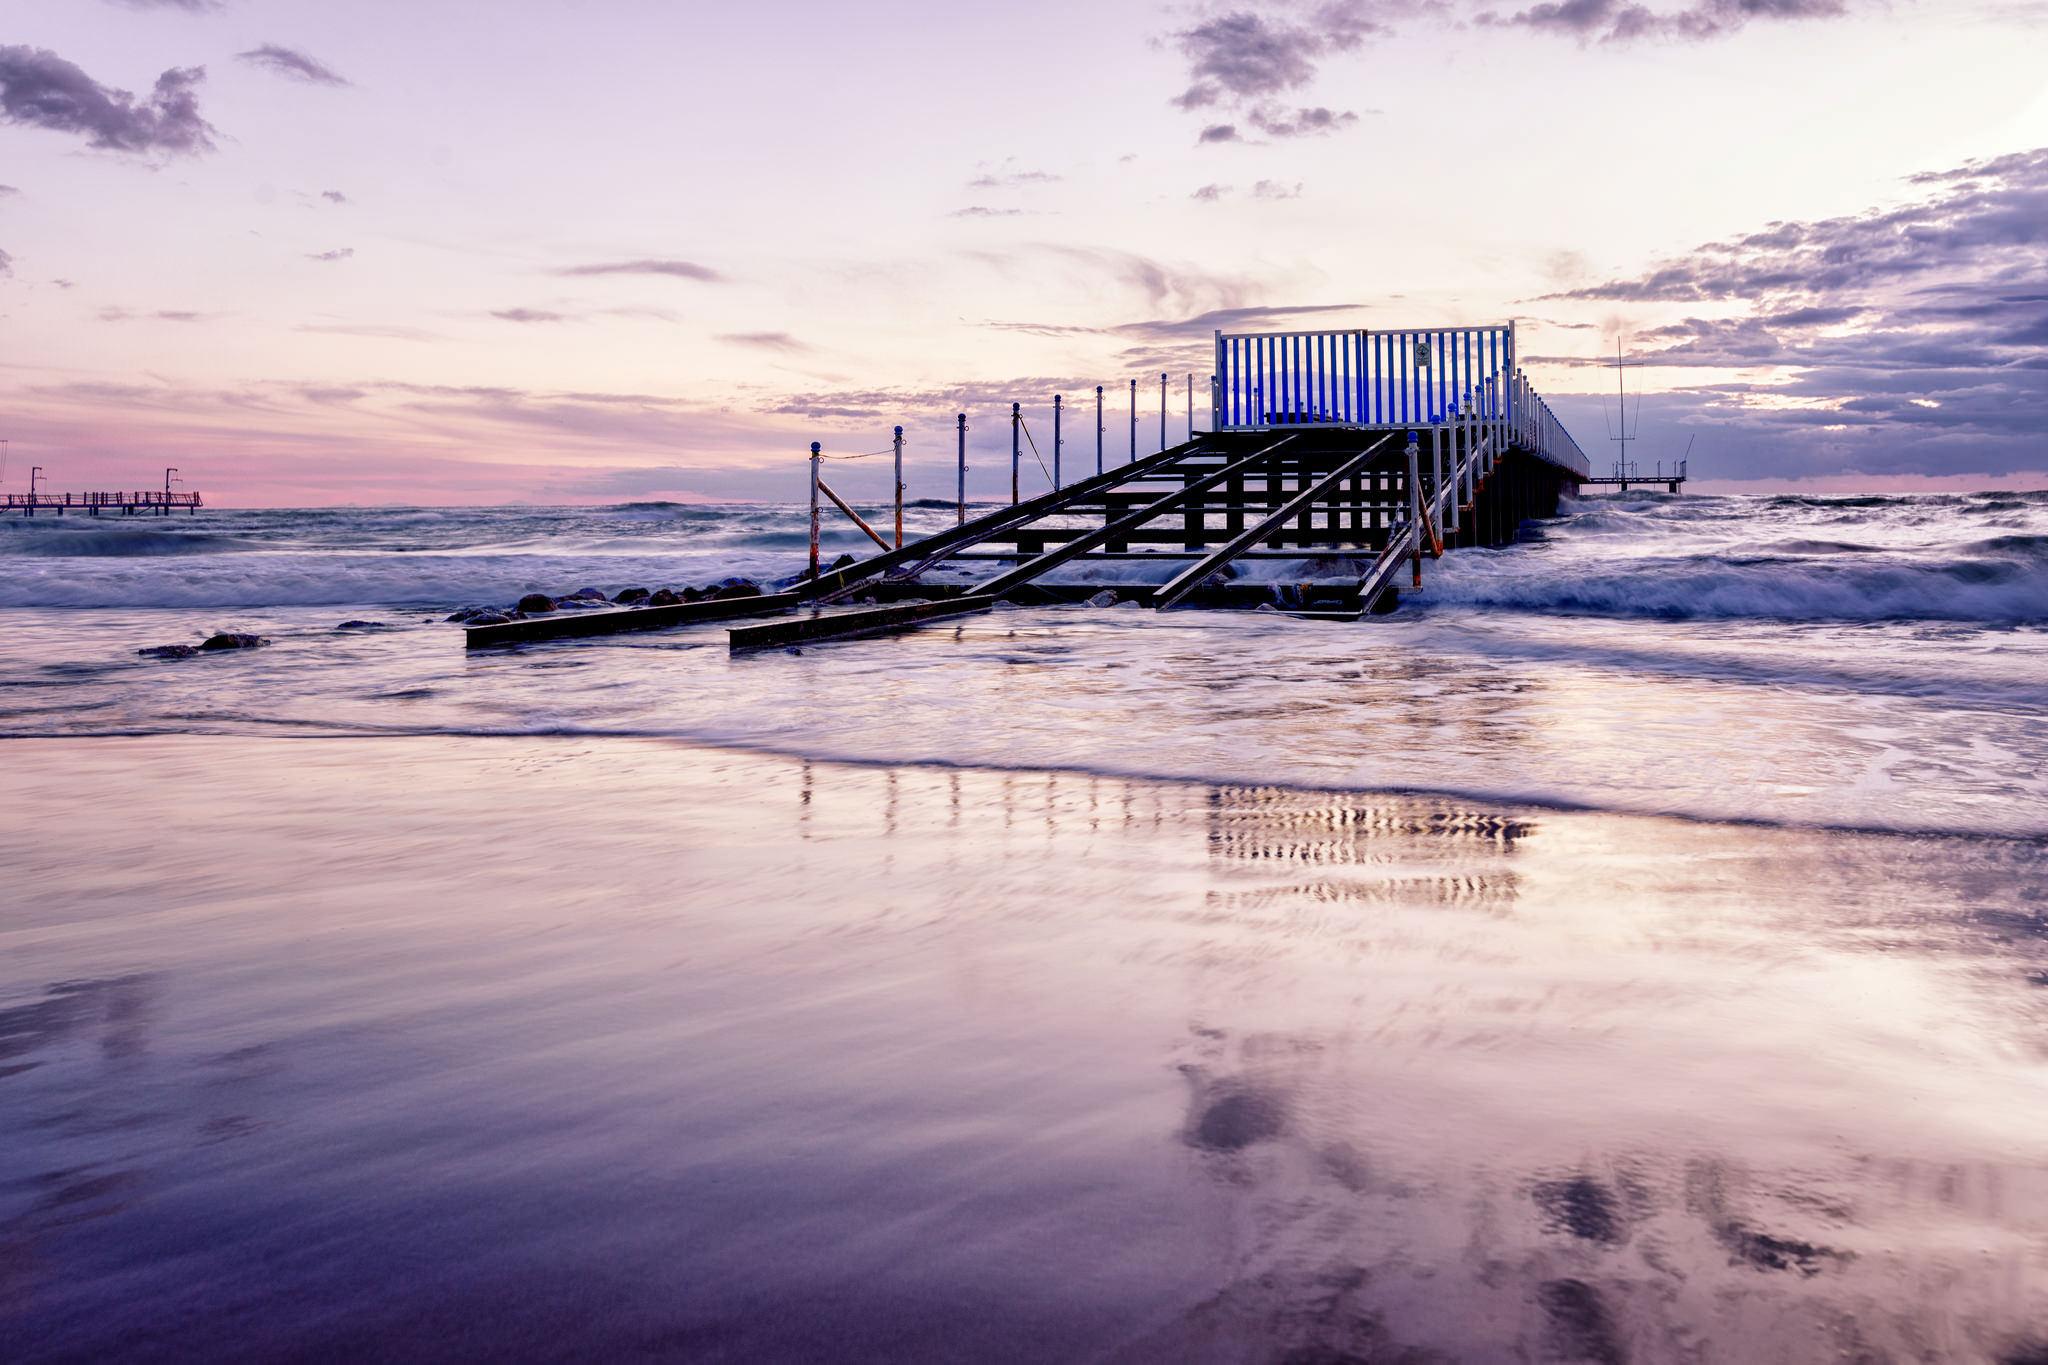 Landschaftsfotografie fotograf filmemacher frankfurt patrick schmetzer drohne landschaft natur 11